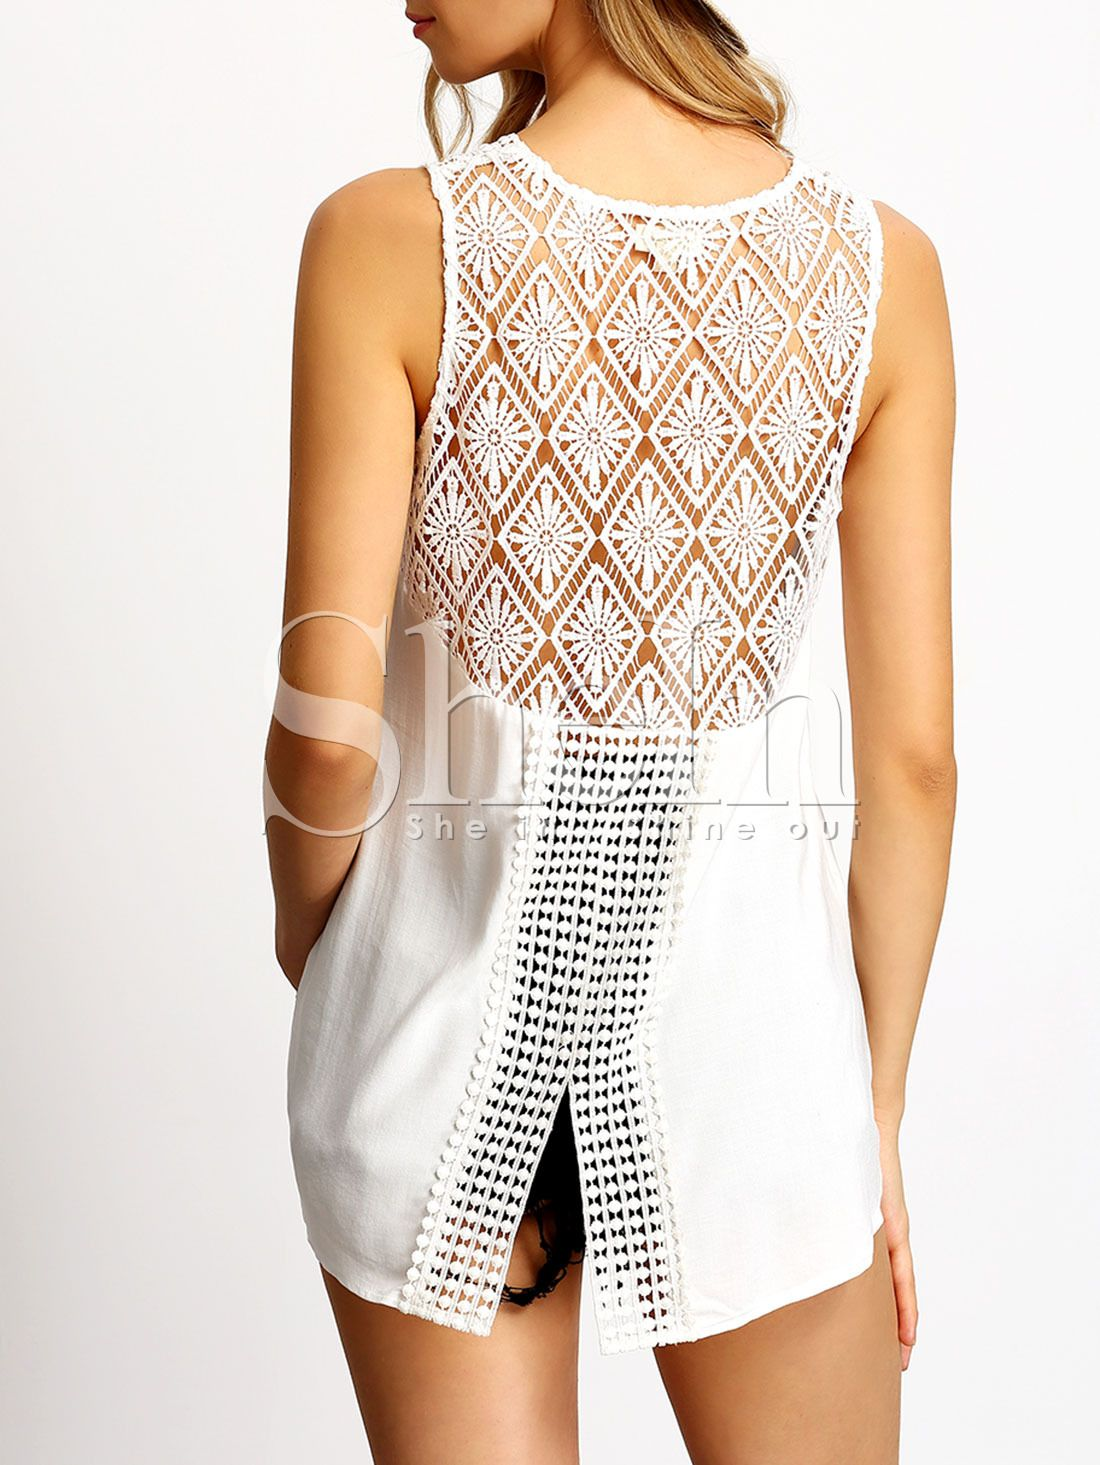 Blusa sin manga crochet encaje -blanco | Blusas | Pinterest | Blusas ...